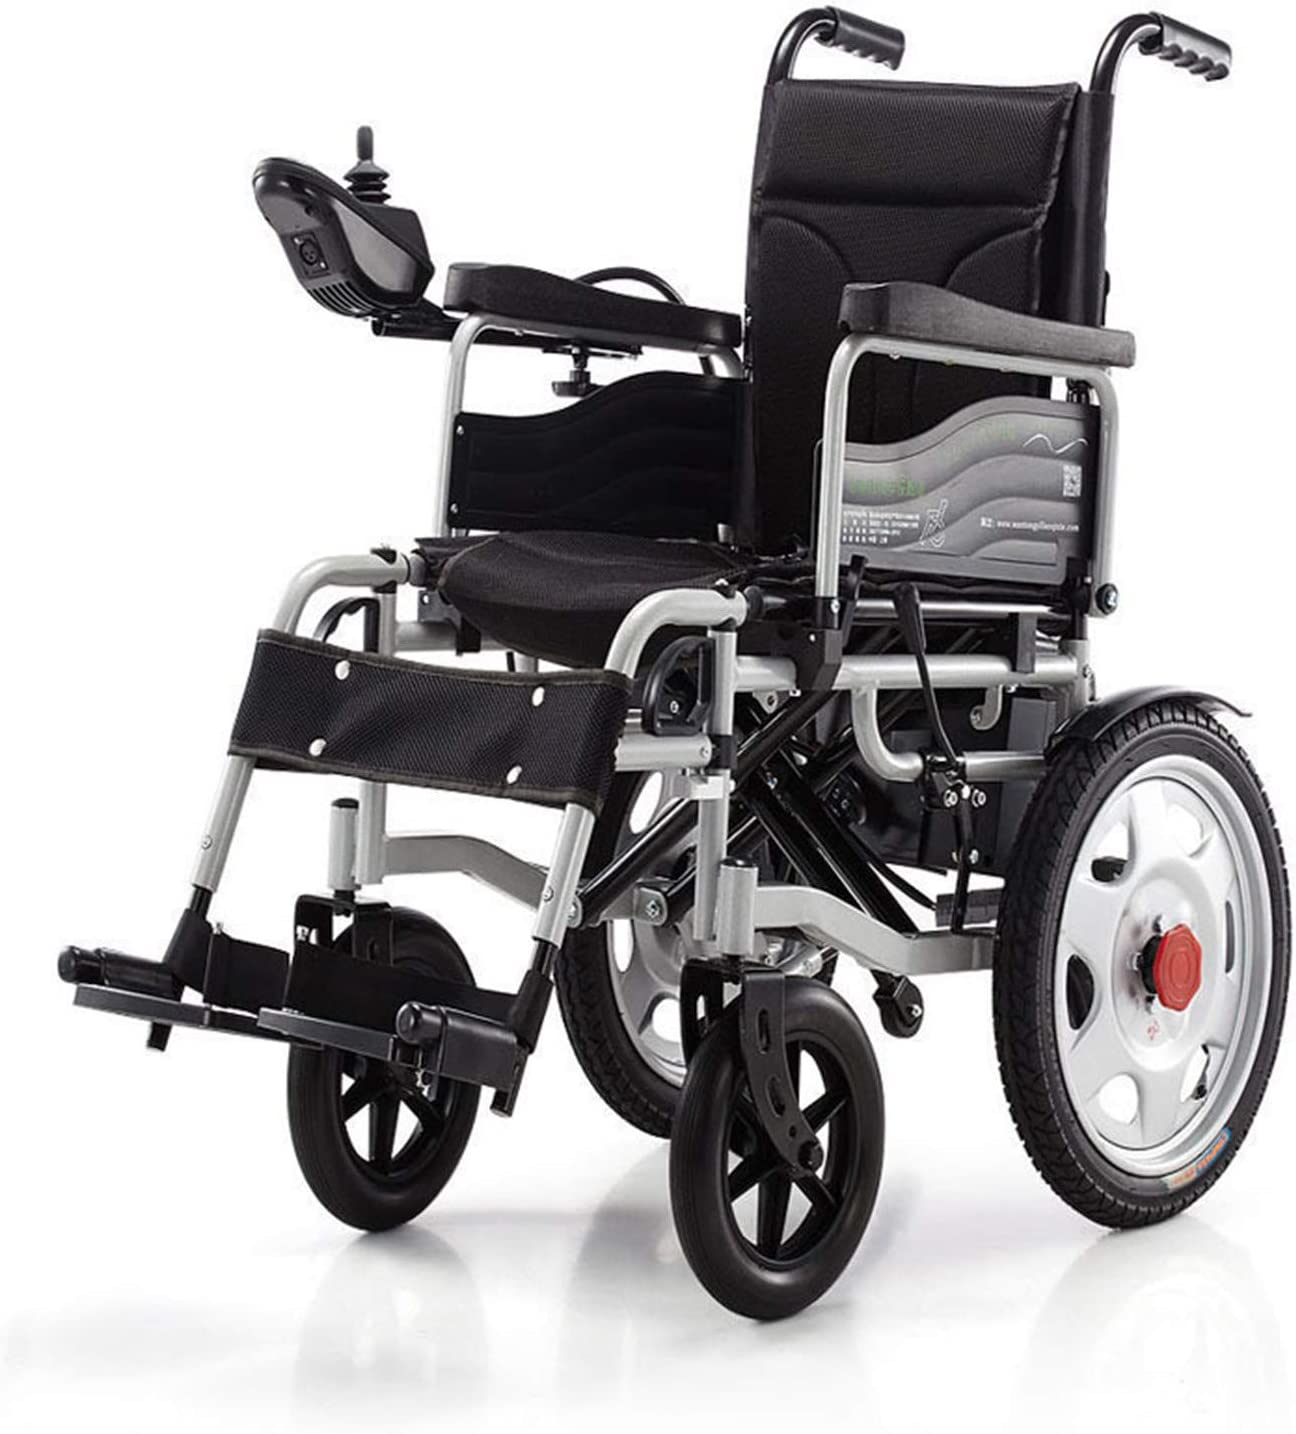 WZCXYX Silla de Ruedas eléctrica Plegable, Motor de Alta Potencia de 500W / kilometraje de 15 km, Modo Doble Manual eléctrico Black 115 * 62 * 93cm